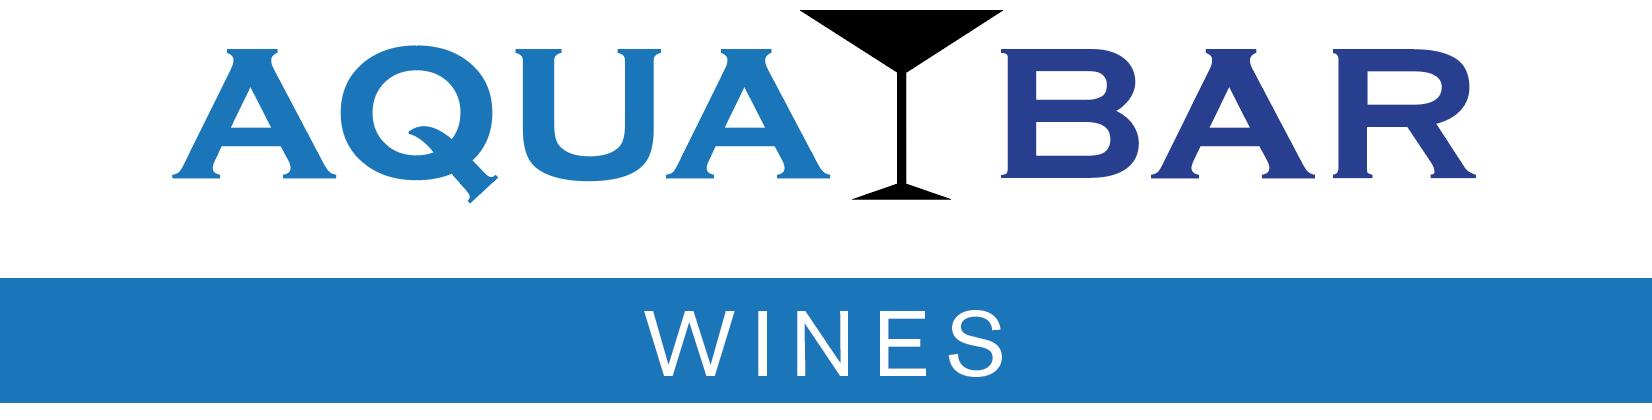 AB_wines-header.png